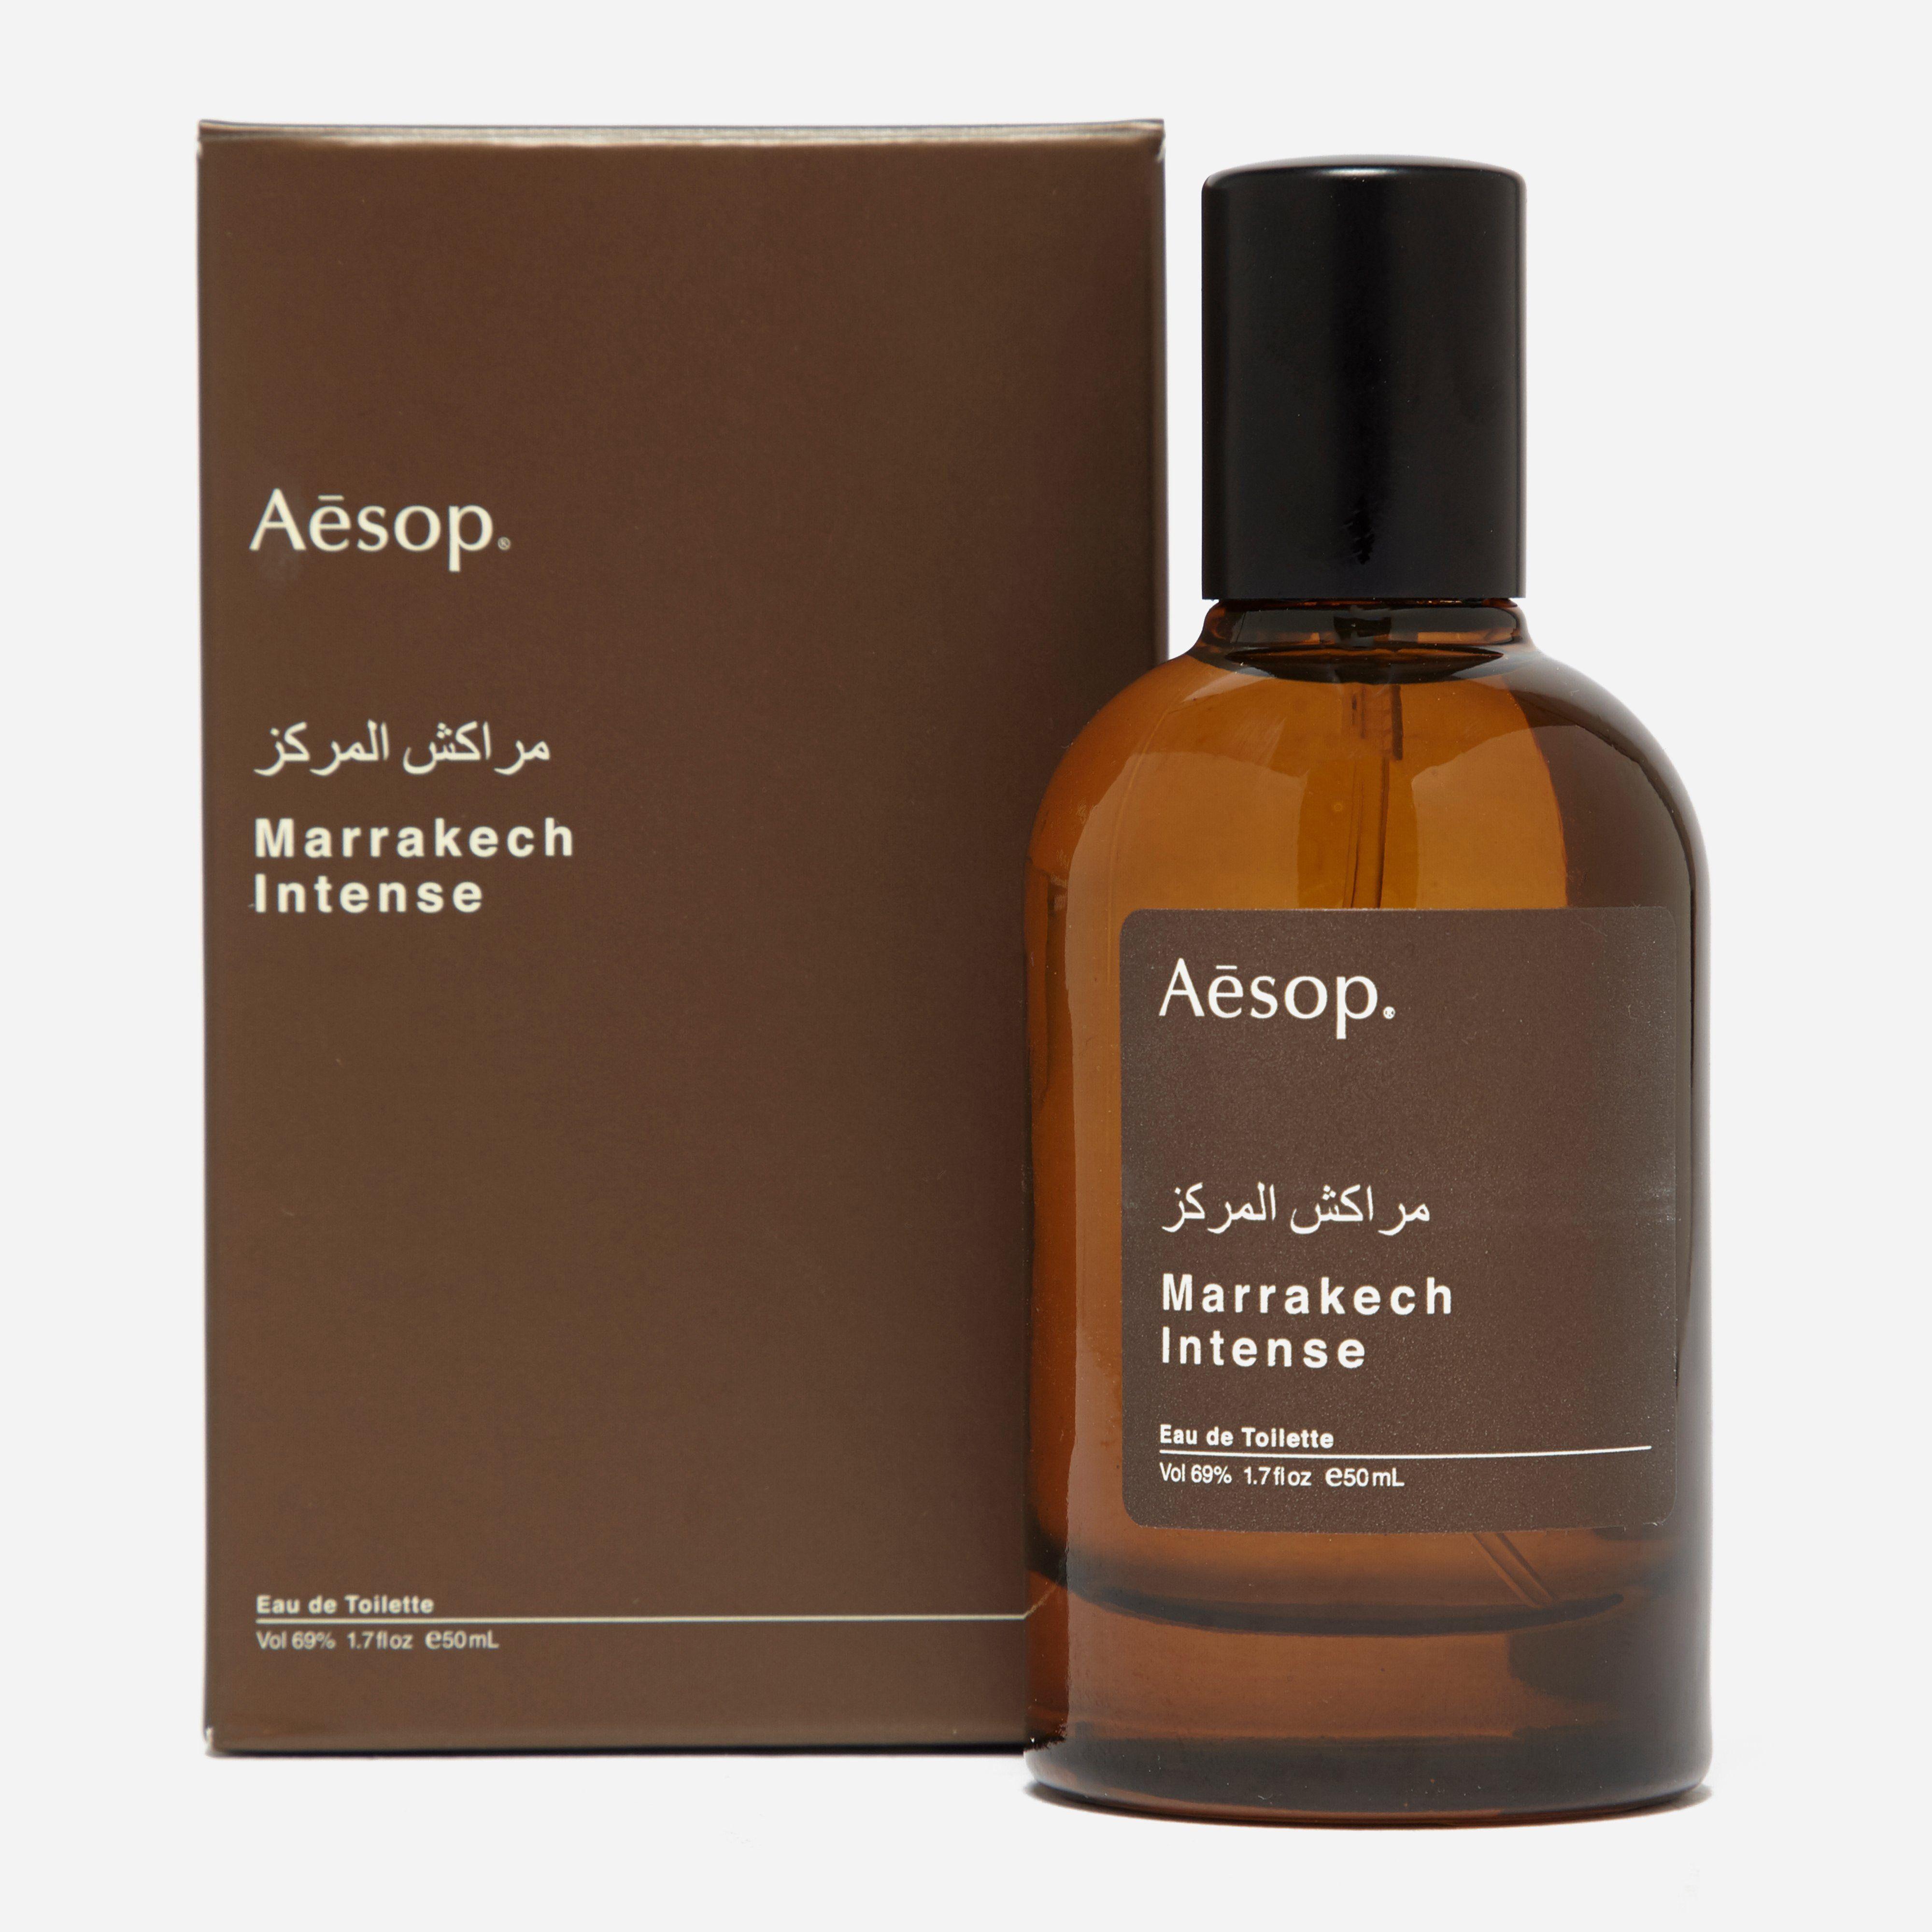 Aesop Marrakech Intense Eau de Toilette 50ml